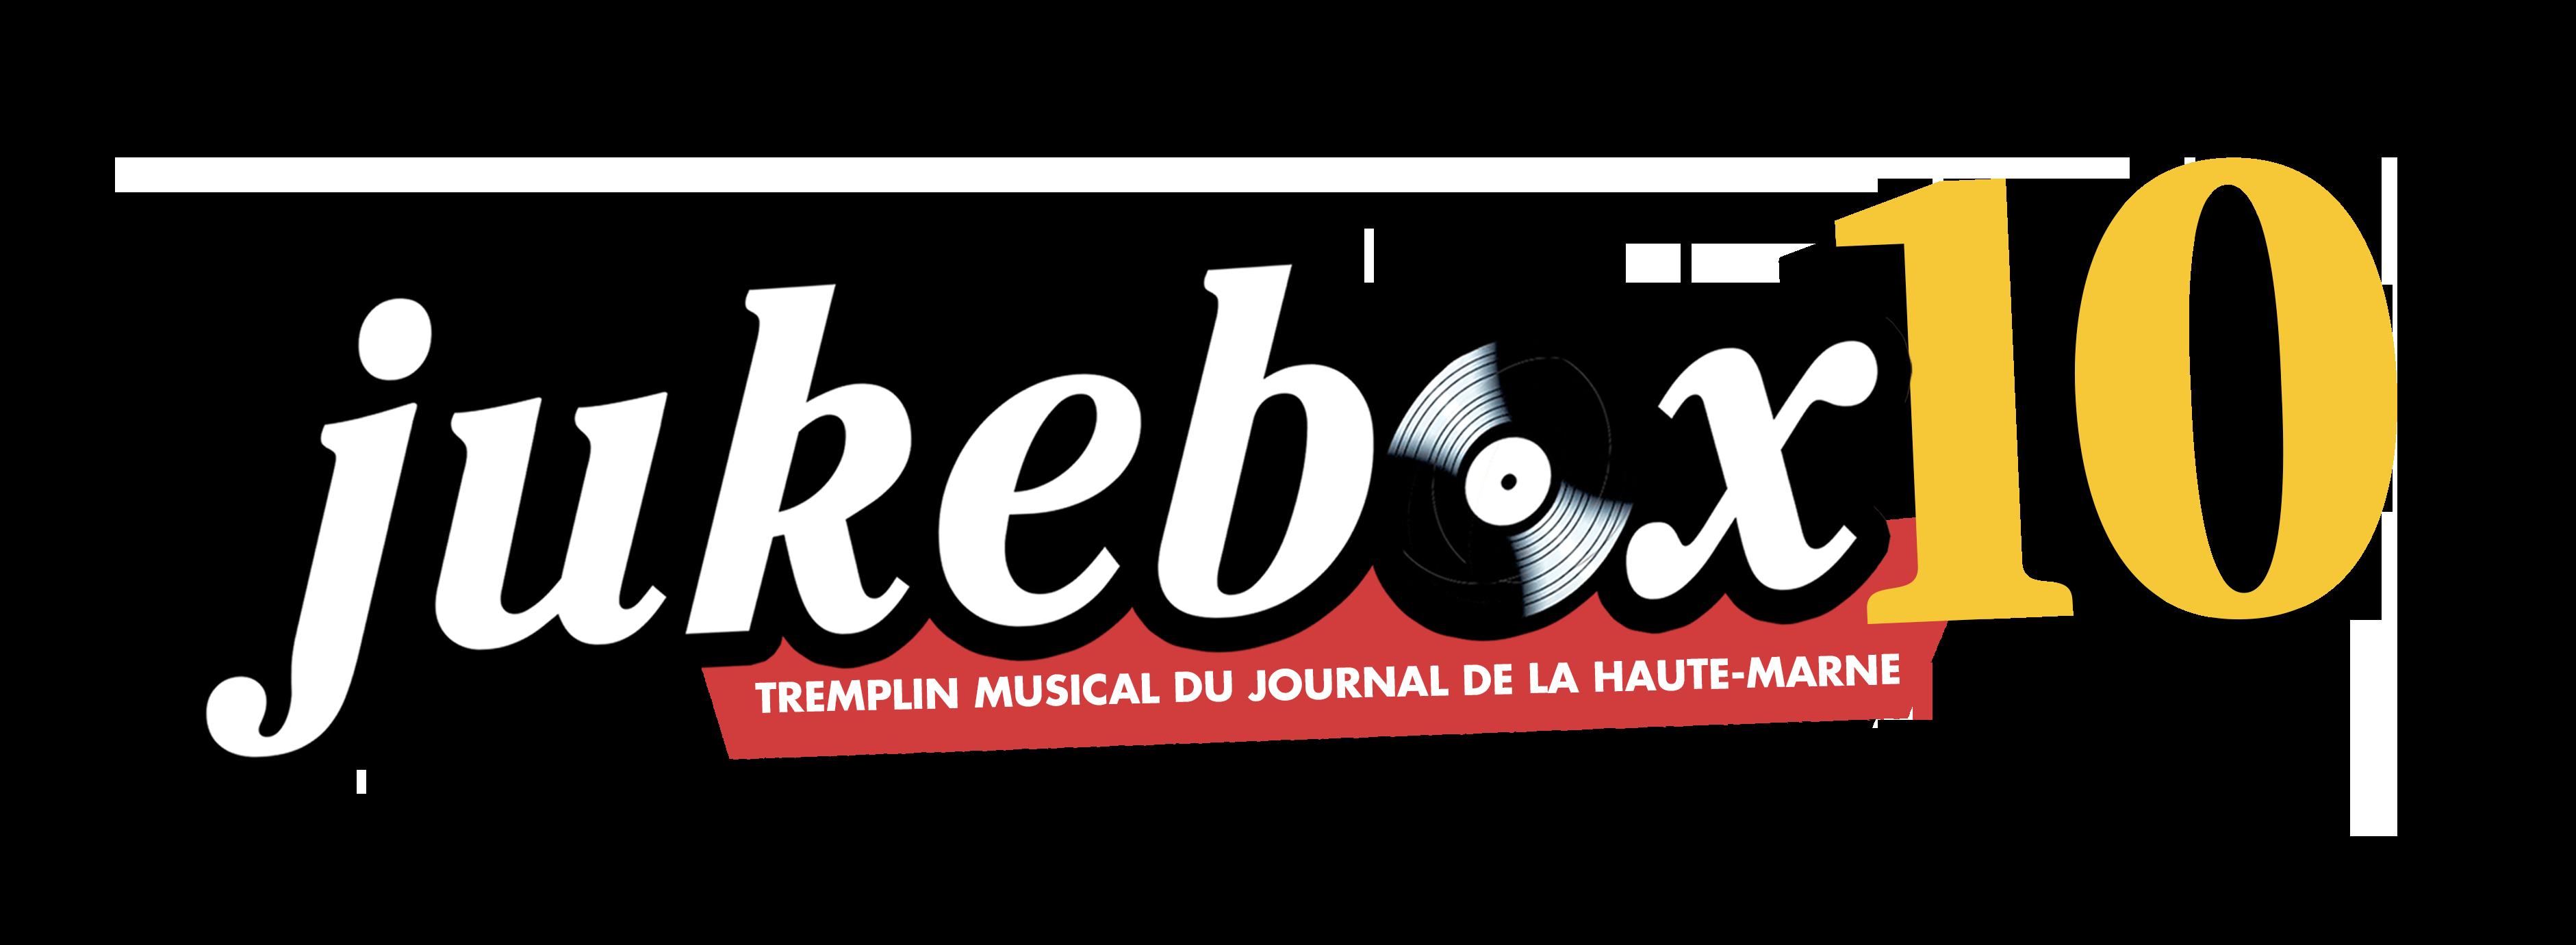 JHM JUKEBOX 2020